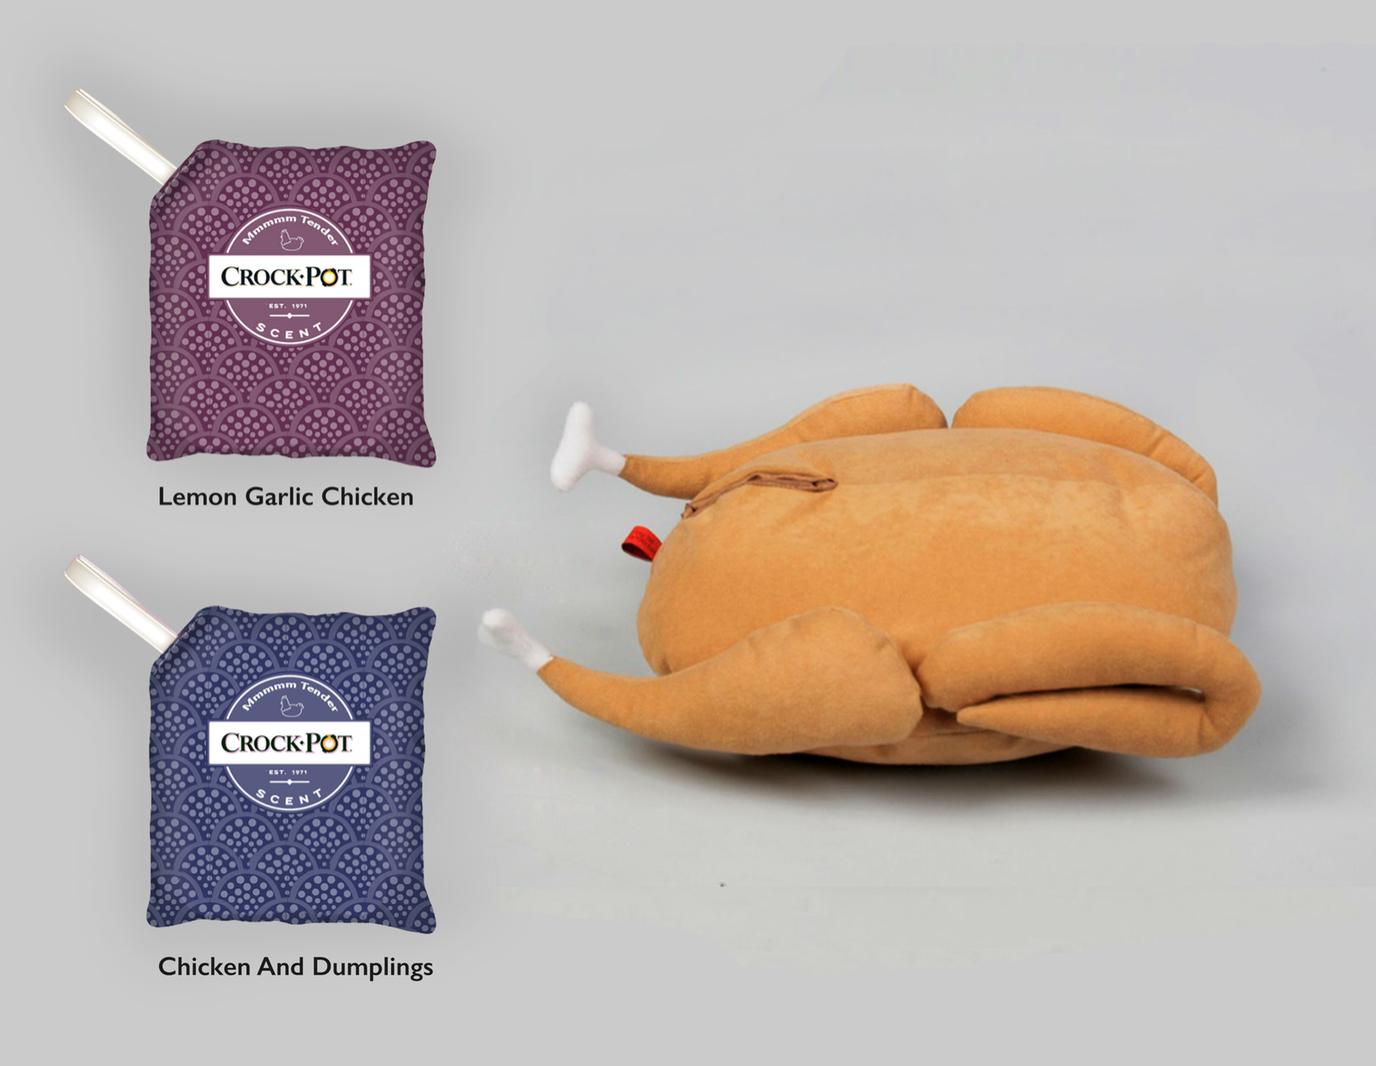 Crockpot Pillow 2.png